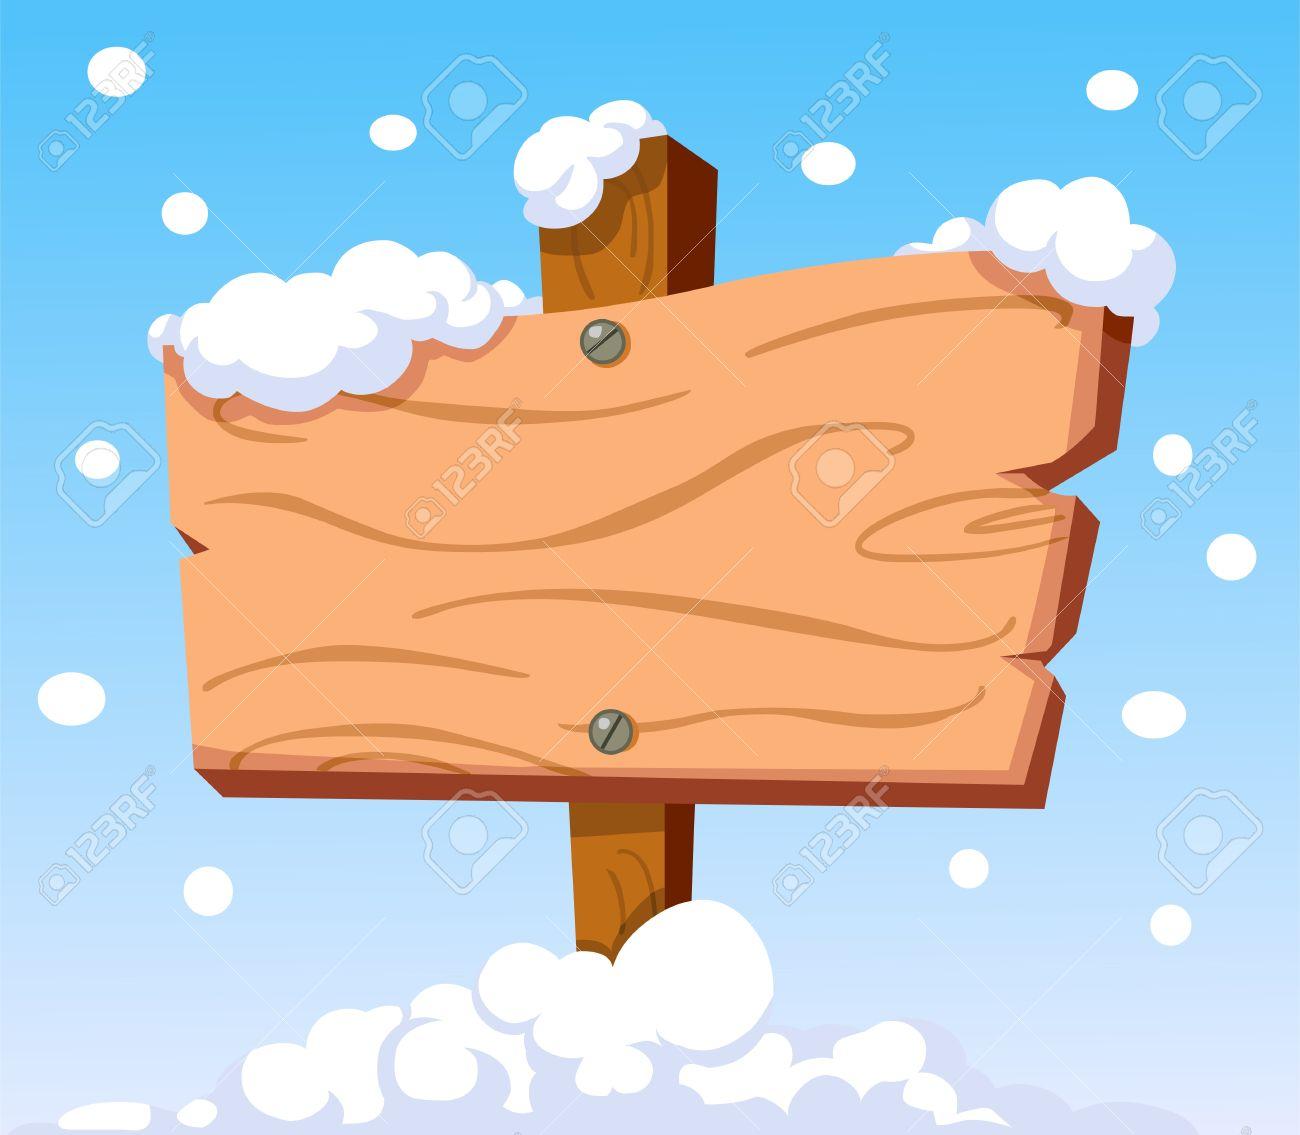 Cartoon wooden sign in the snow Stock Vector - 16215398